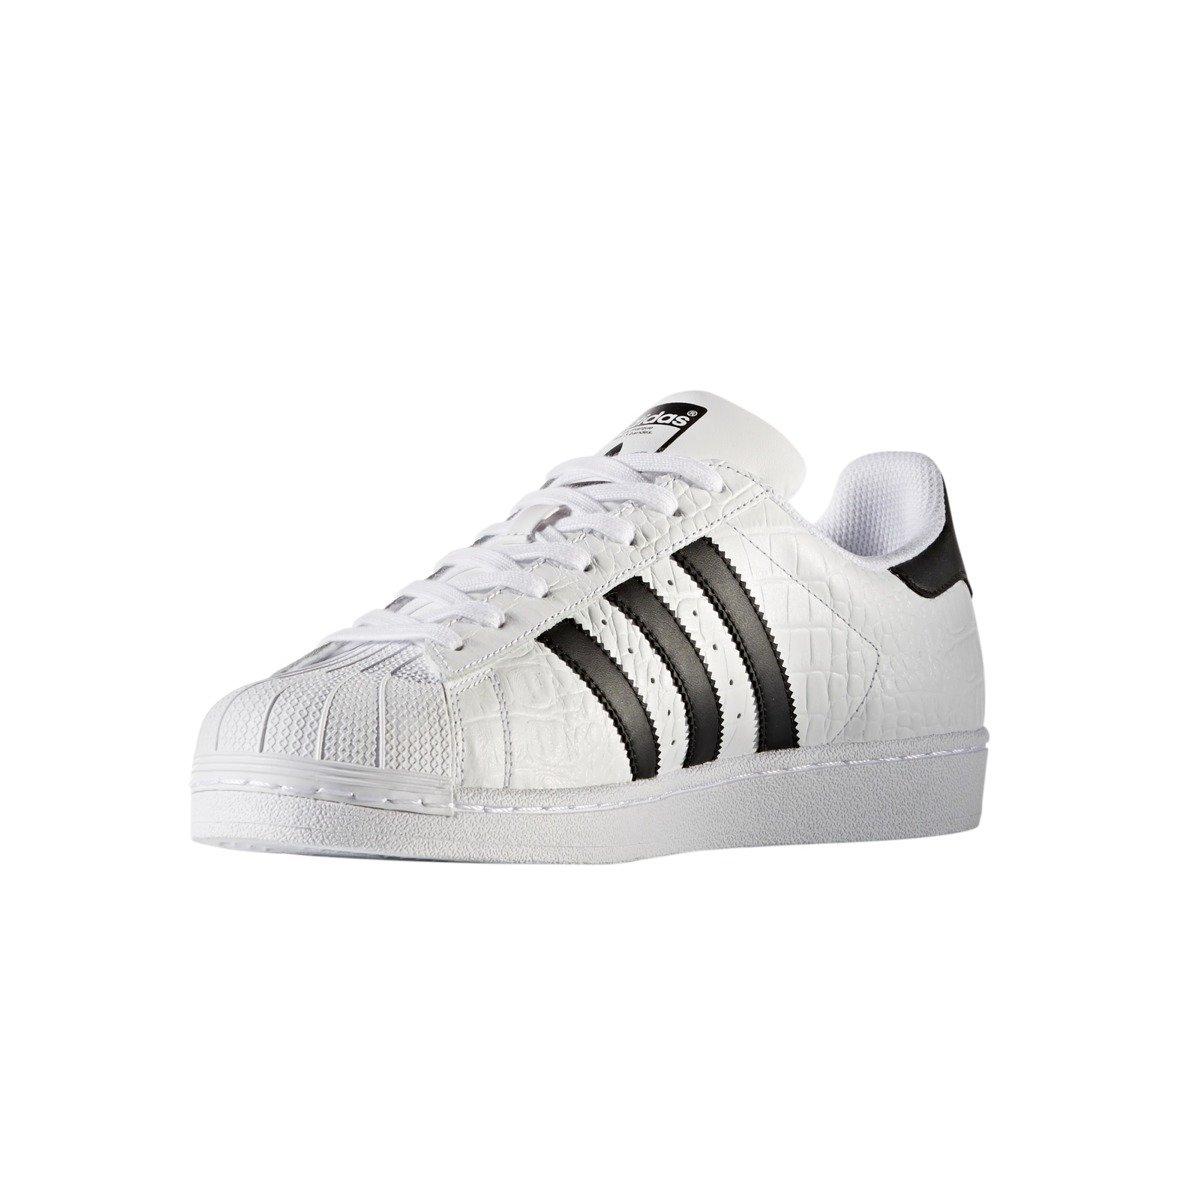 best sneakers 154eb 69c36 Adidas Originals Superstar Animal Print Shoes - BZ0198